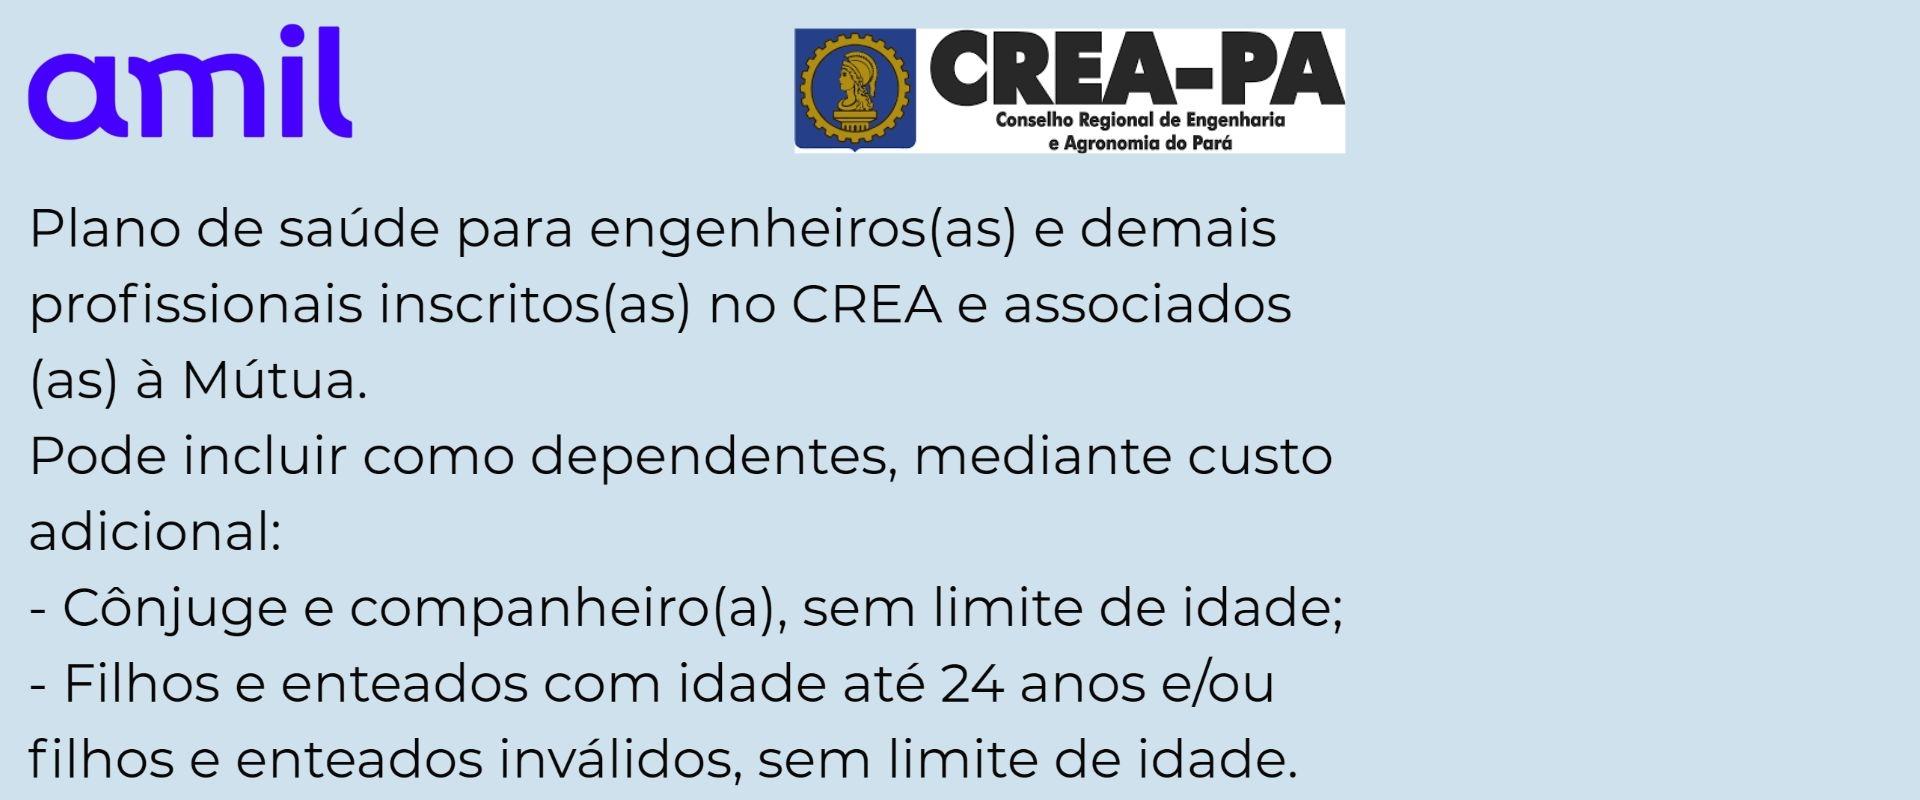 Amil CREA-PA